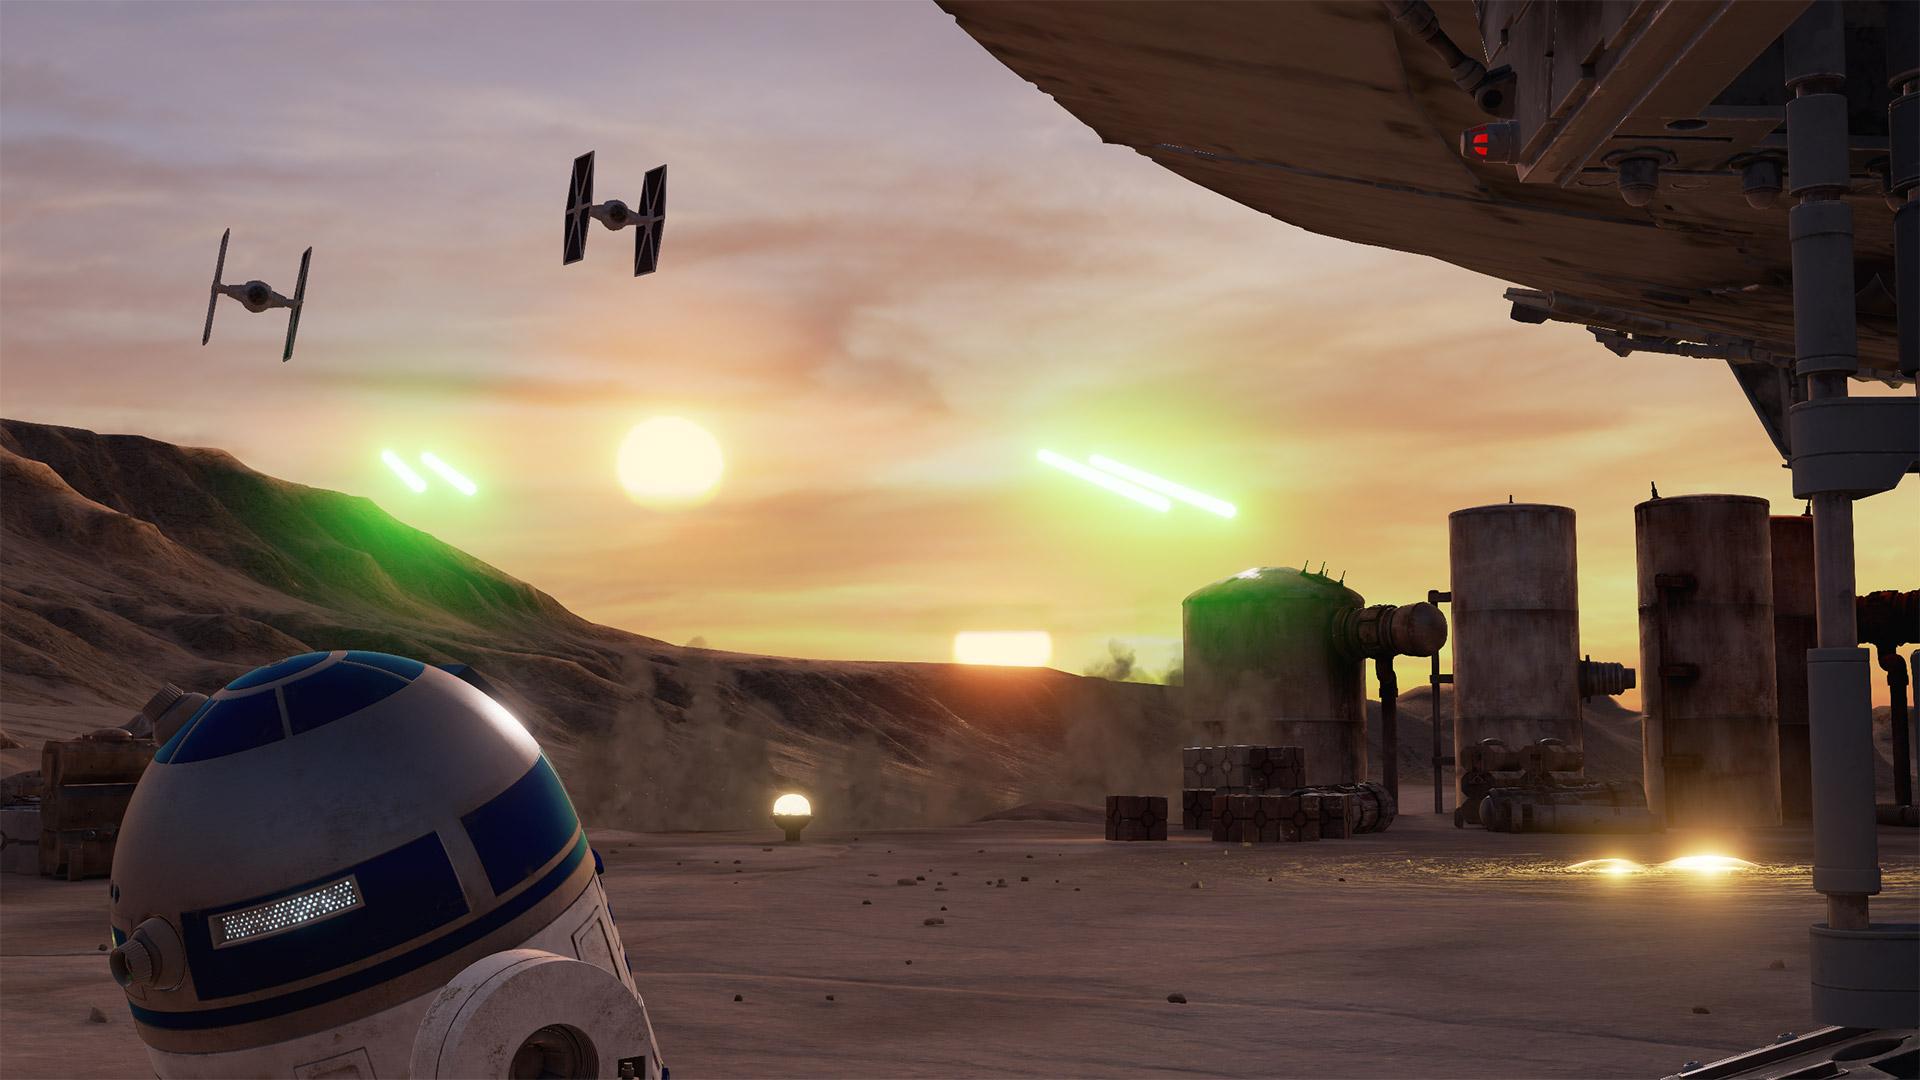 star-wars-trials-of-tatooine-virtual-reality-htc-vive-vr-tie-fighters-r2d2.jpg